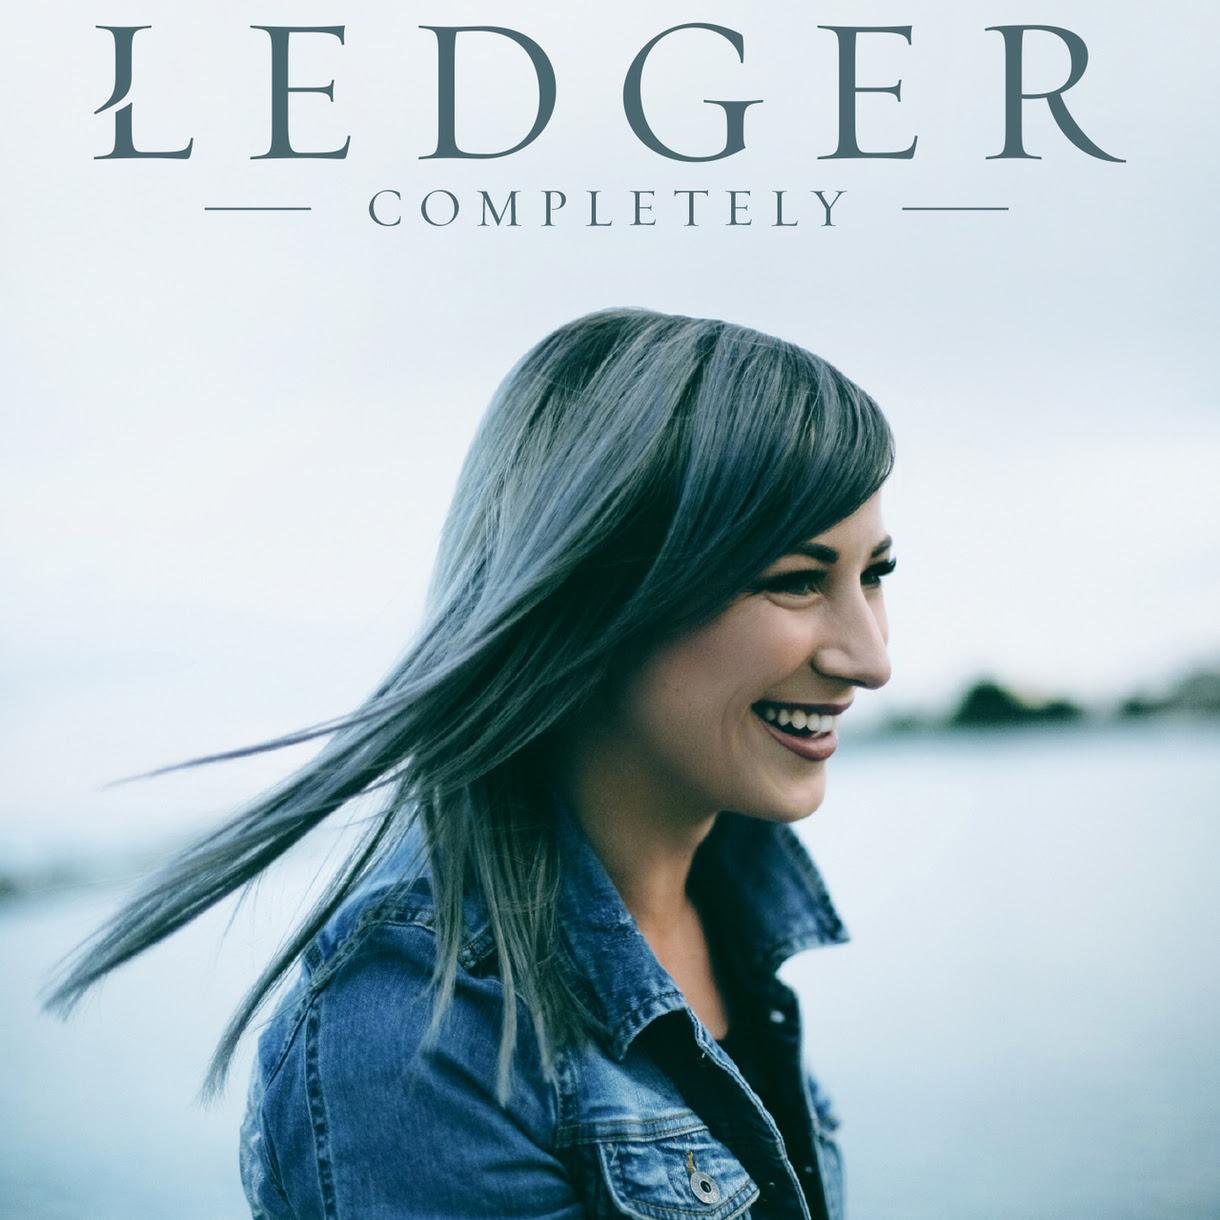 LEDGER - Completely (Free Mp3 Download)